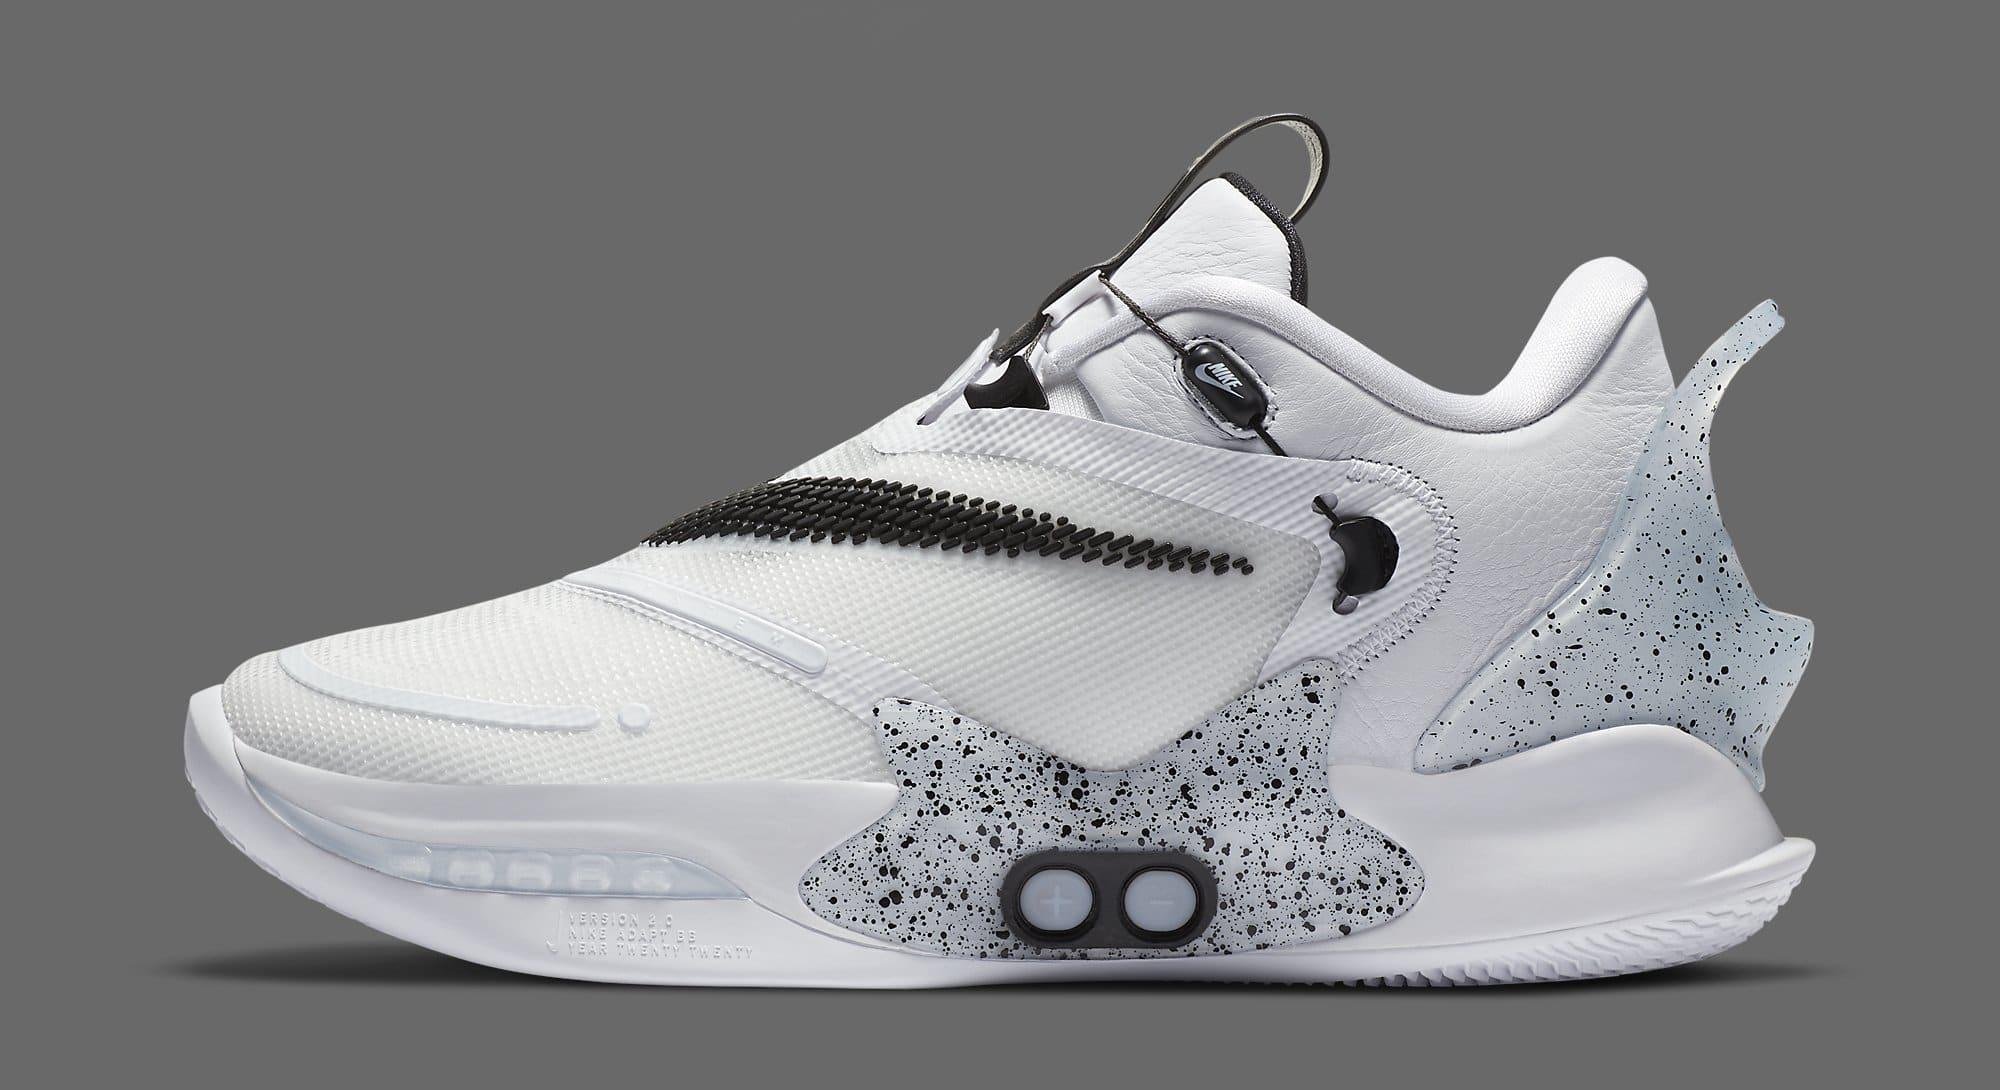 Nike Adapt BB 2.0 'Oreo' BQ5397-101 Lateral